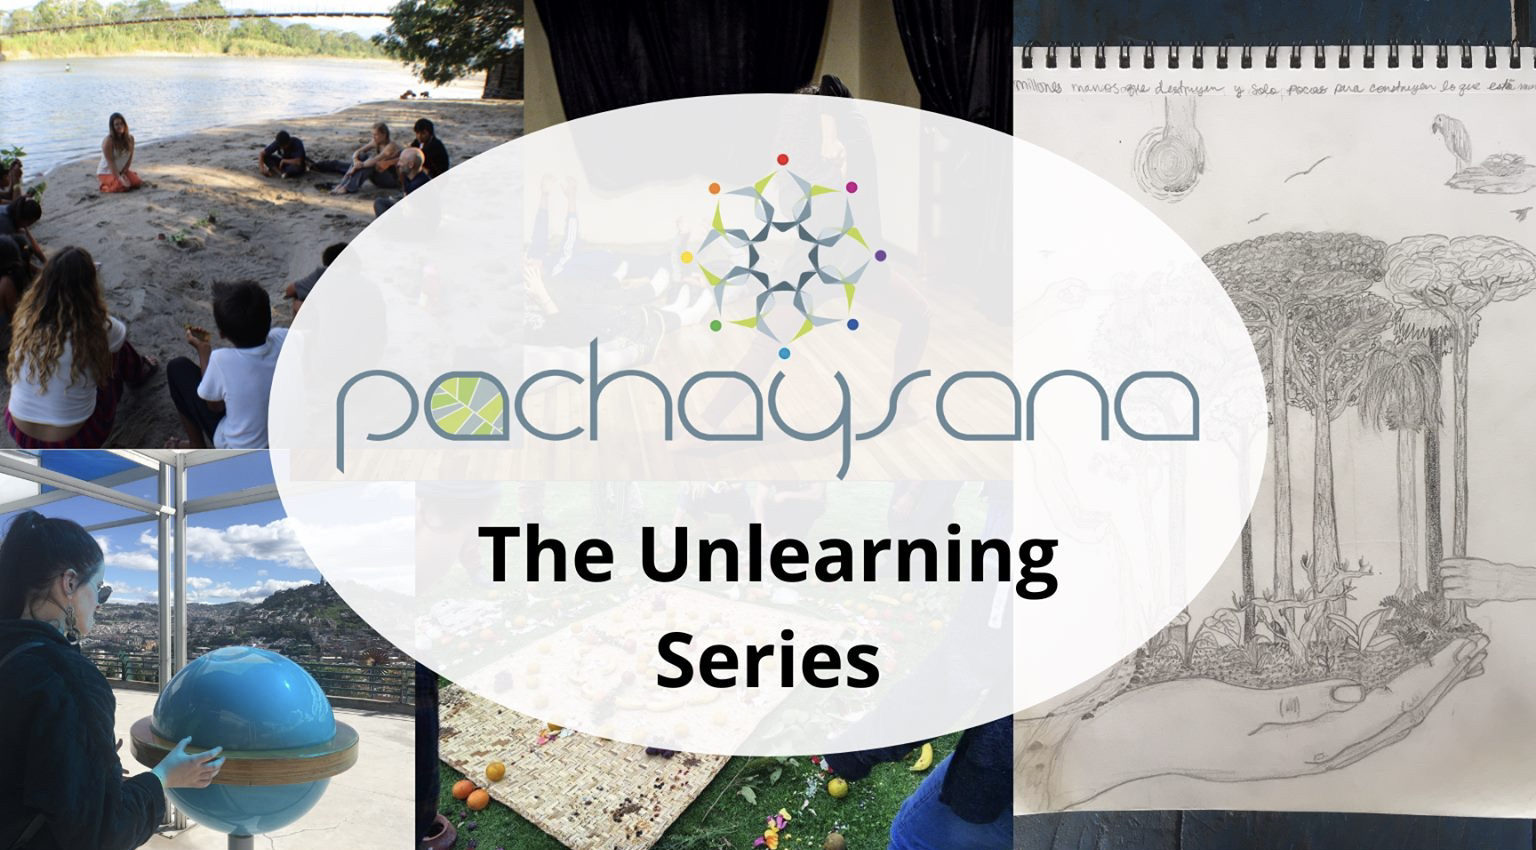 Pachaysana Unlearning Series Kicks Off September 21